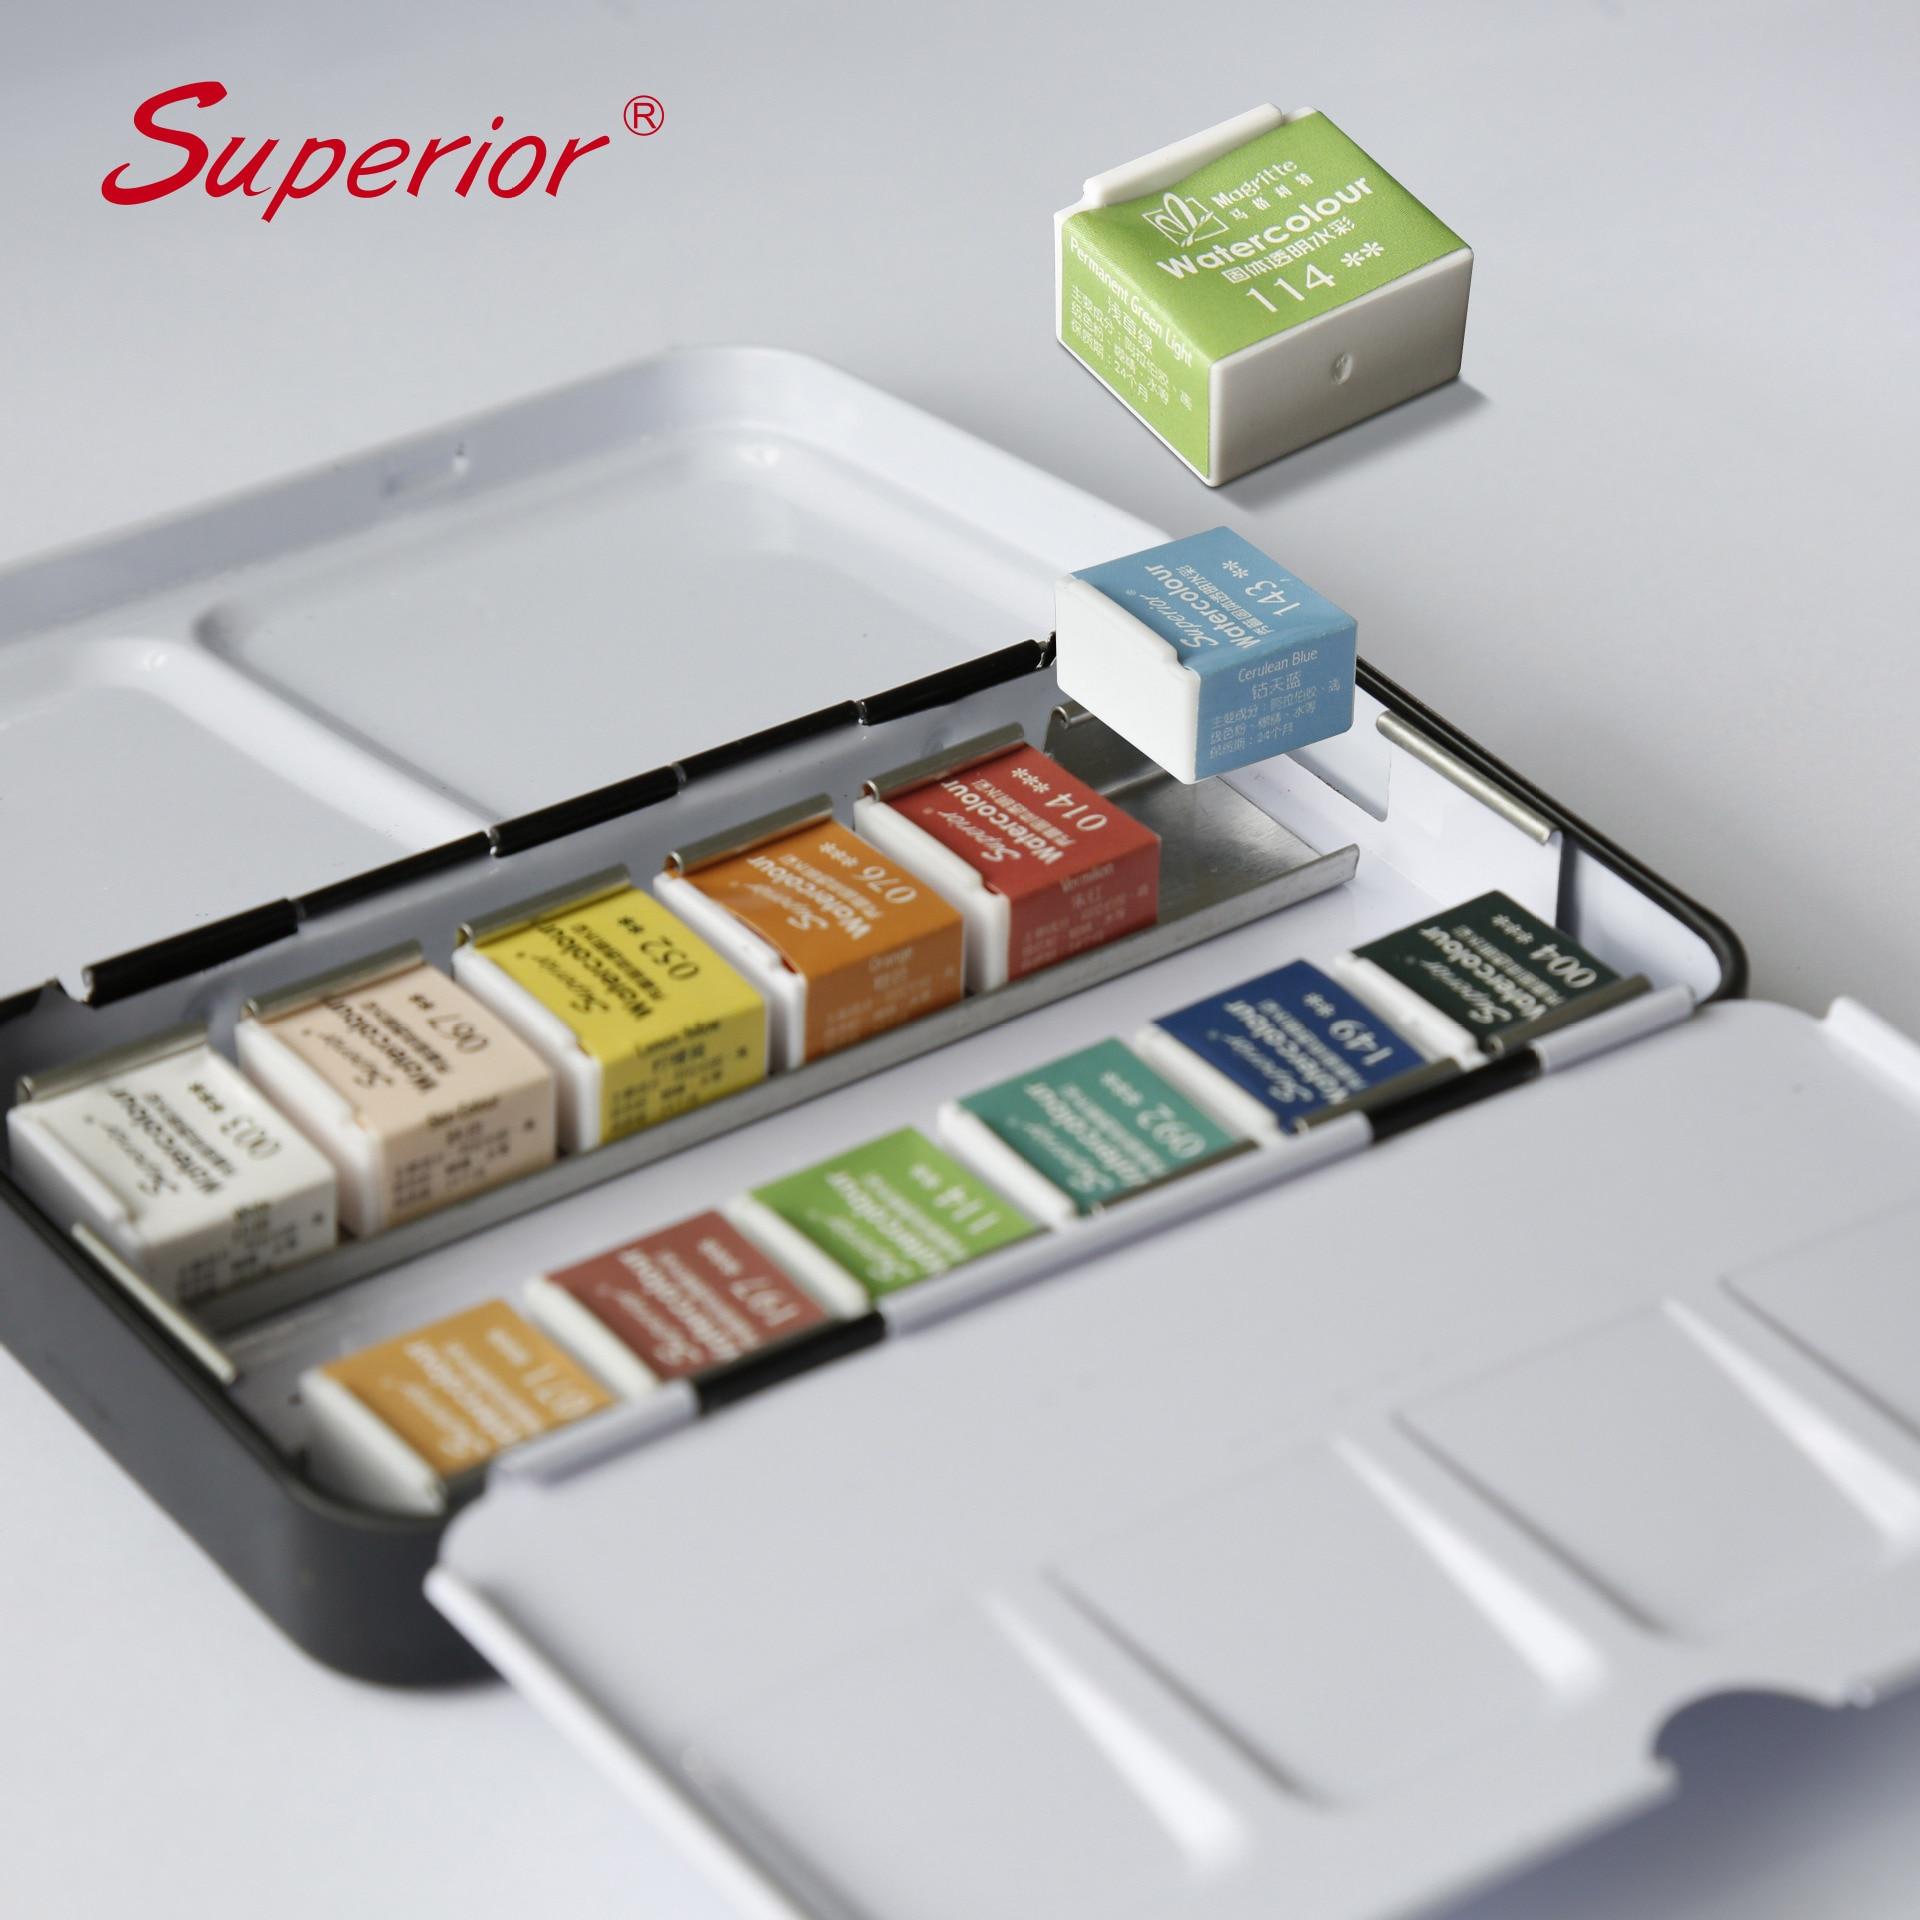 superior 12 24 36 48 cores pigmento solido conjunto com pincel aquarela aquarela tintas conjunto pigmento